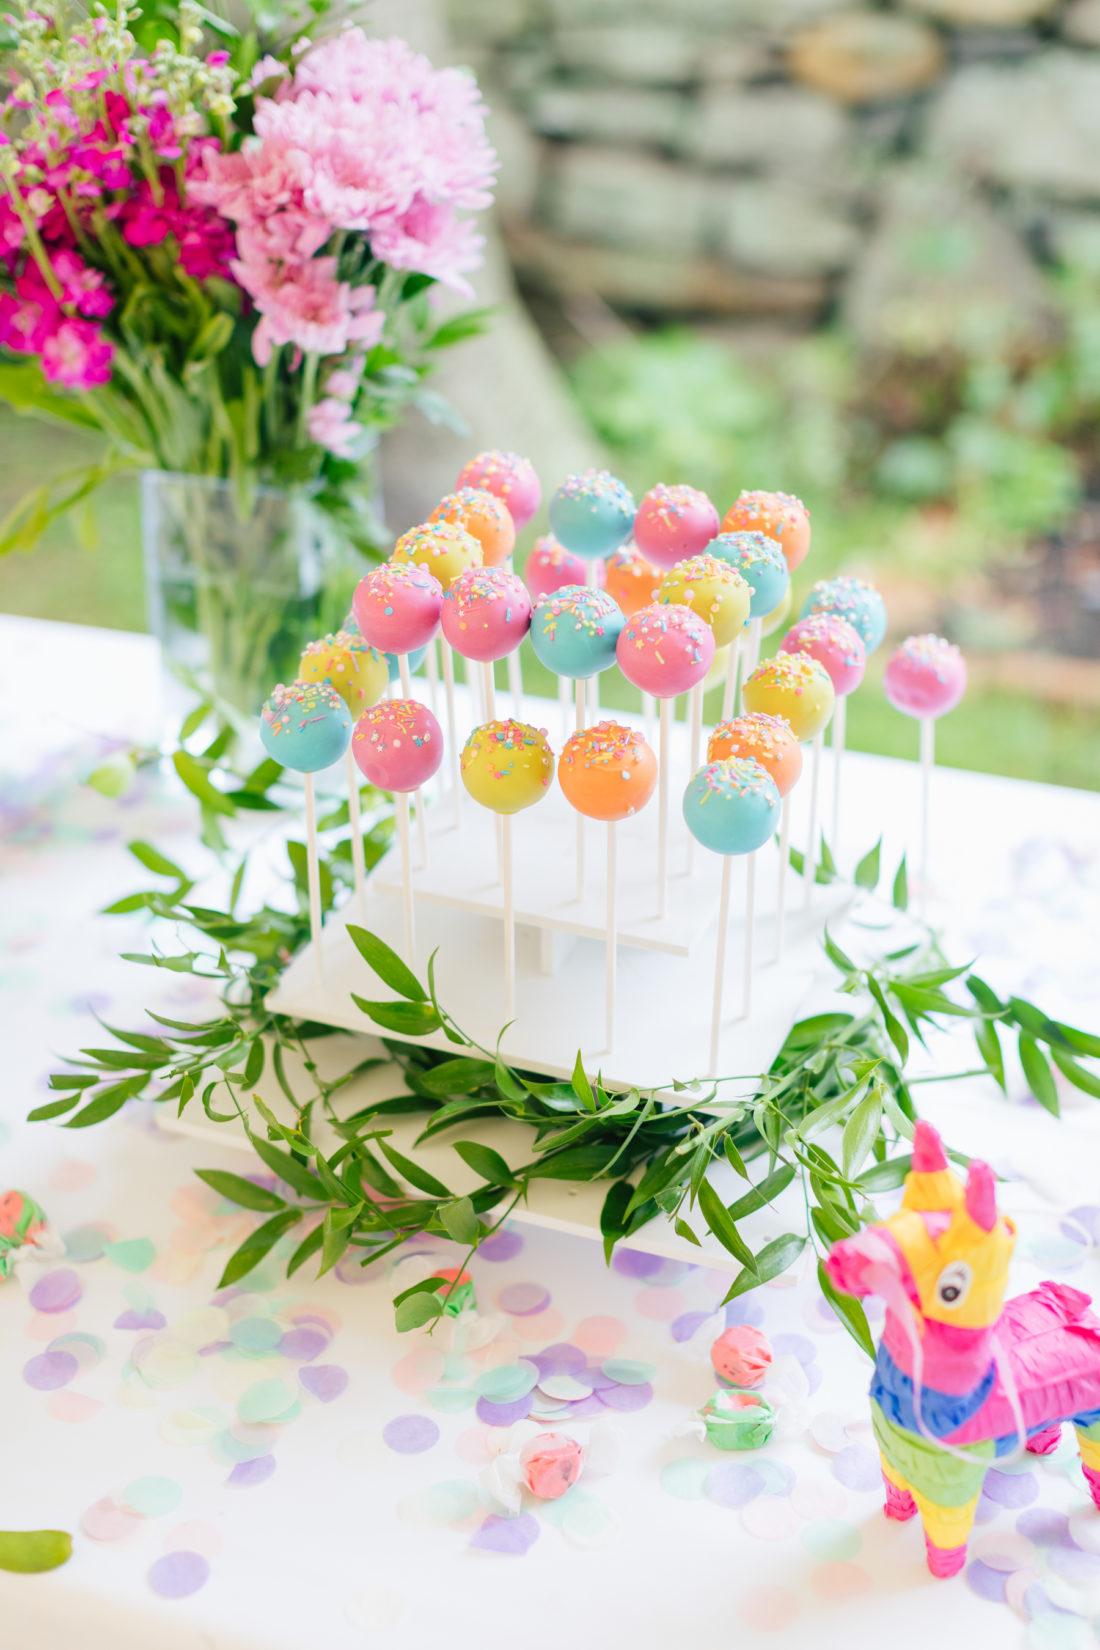 Cake Pops at Marlowe Martino's Cinco de Marlowe themed 5th birthday fiesta